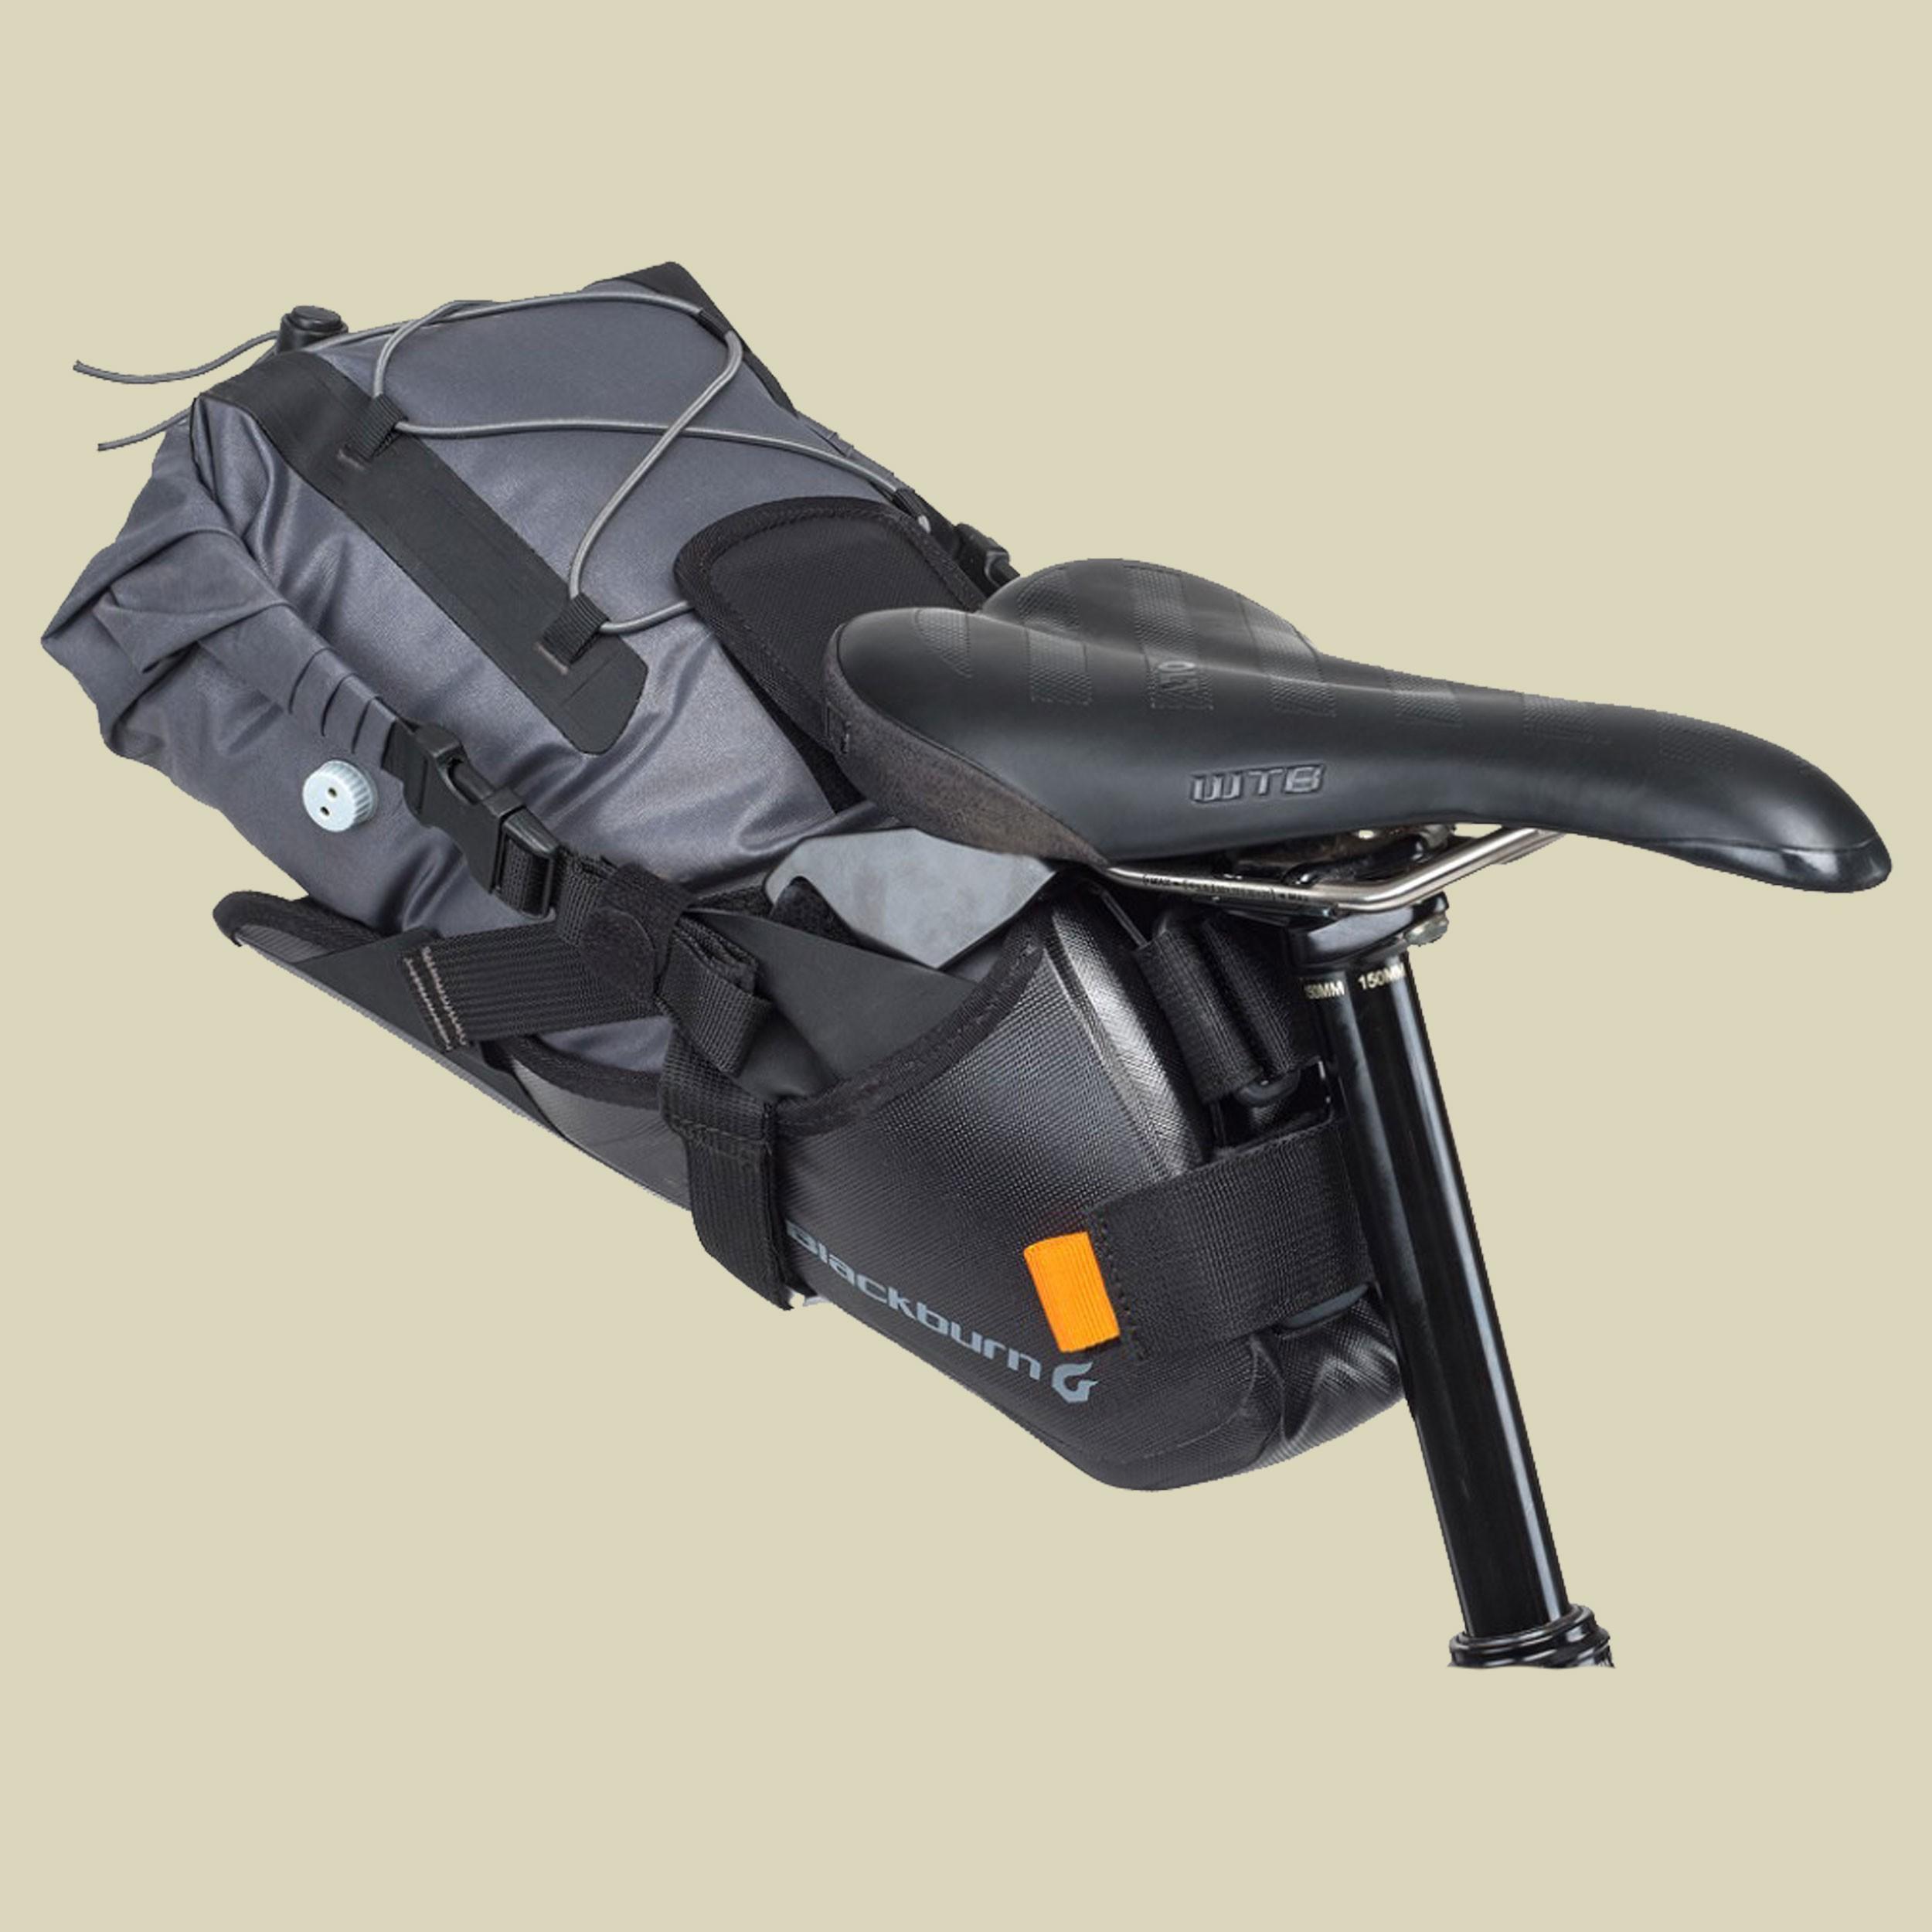 grofa_blackburn_bbn_outpost_elite_universal_seat_pack_black_7097808_3510_650_fallback